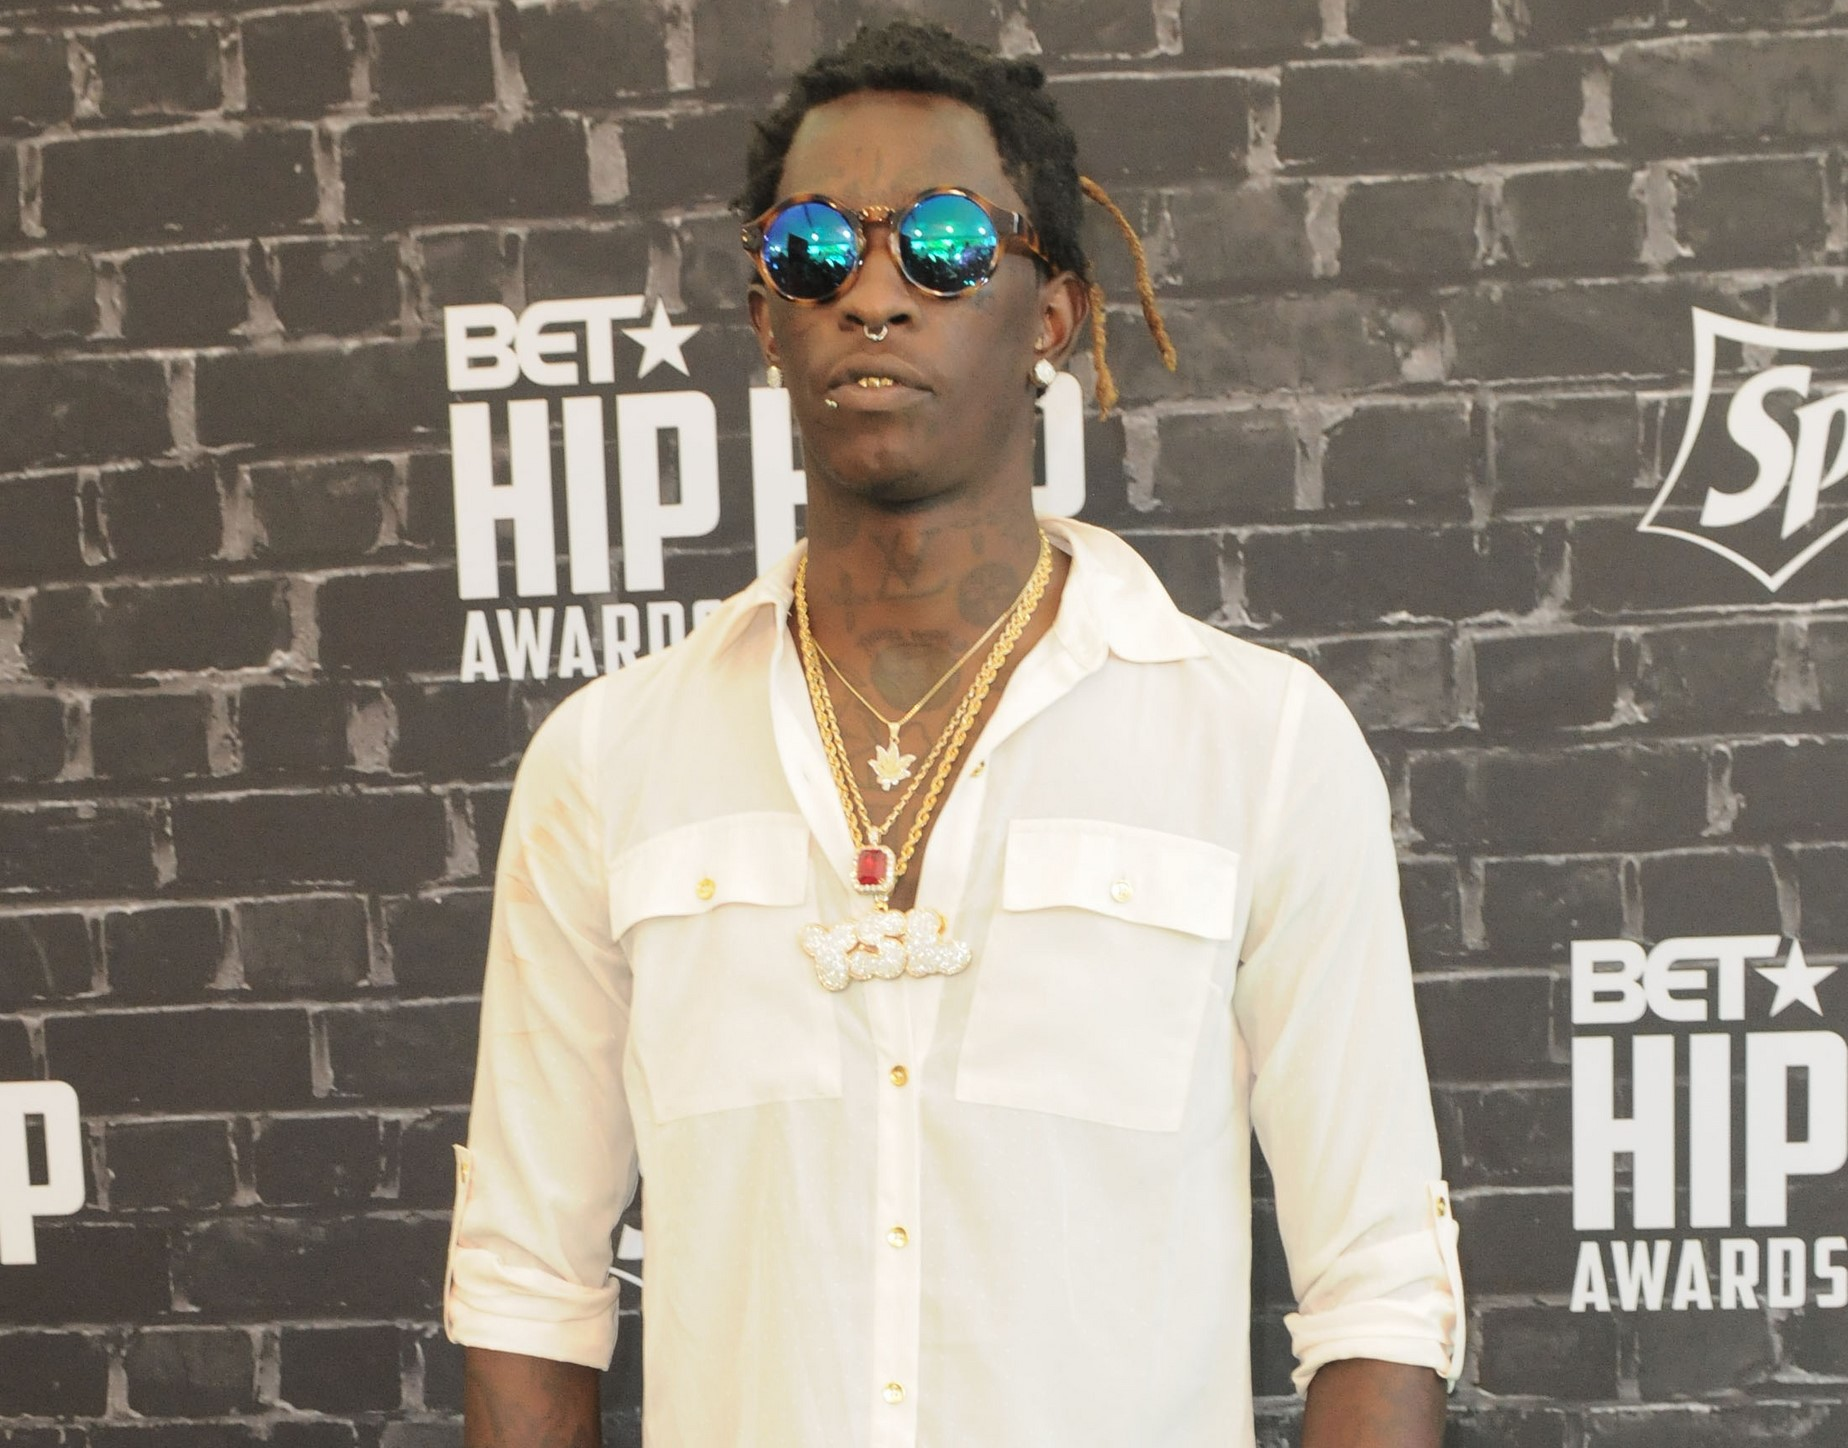 09/20/2014 - Young Thug - BET Hip Hop Awards 2014 Presented by Sprite - Arrivals - Boisfeuillet Jones Atlanta Civic Center - Atlanta, GA, USA - Keywords: full length shot, rapper Orientation: Portrait Face Count: 1 - False - Photo Credit: Aaron J. Thornton / PR Photos - Contact (1-866-551-7827) - Portrait Face Count: 1